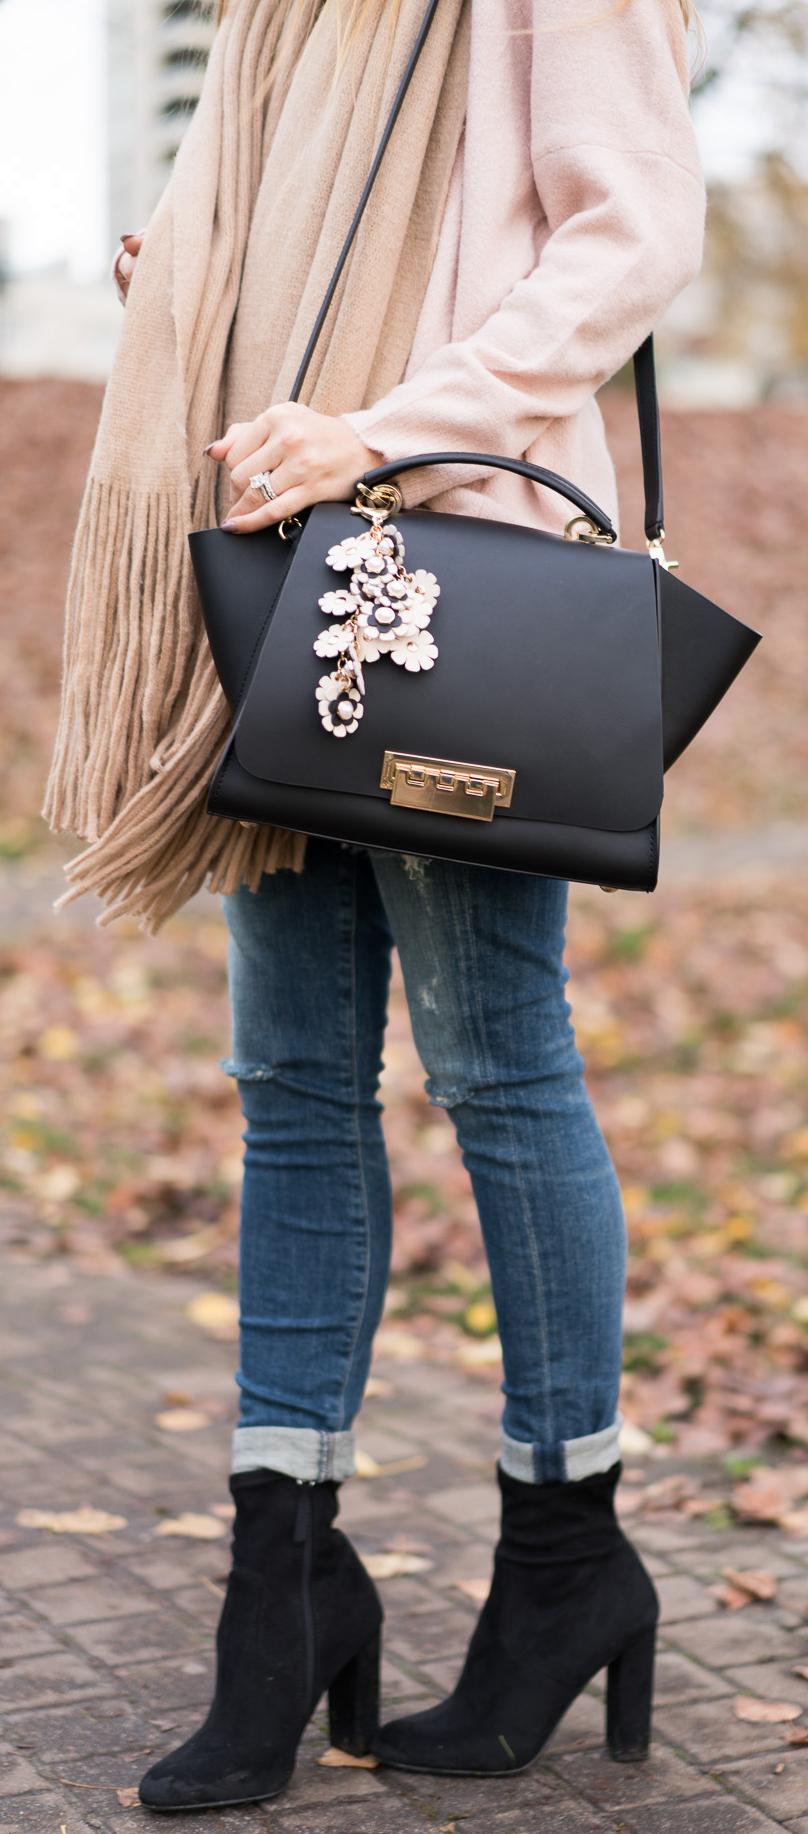 Fall Outfit: Blush Sweater - Legging Ankle Jeans - Scarf - Booties - Zac Zac Posen Handbag - Spring Earthette Floral Charm. Angela Lanter - Hello Gorgeous.